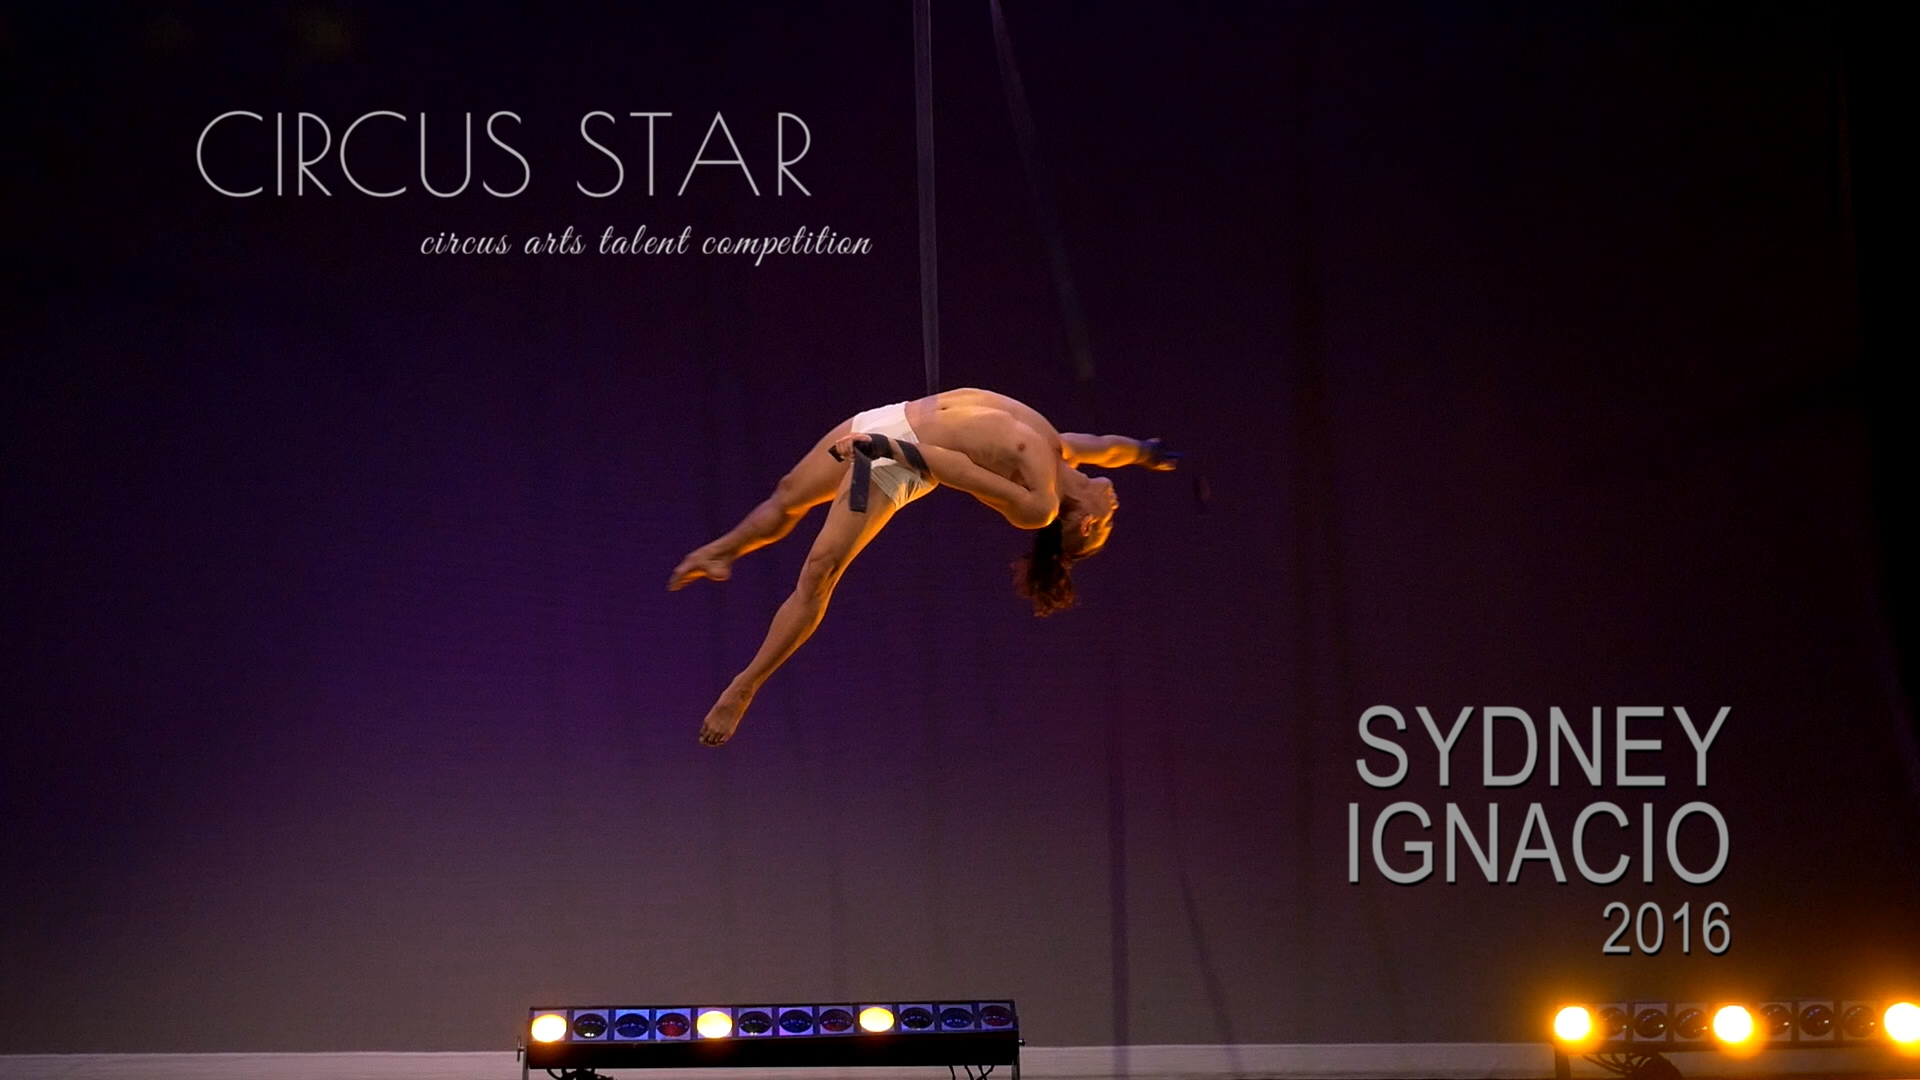 Sydney Ignacio, Circus Star USA 2016 performer